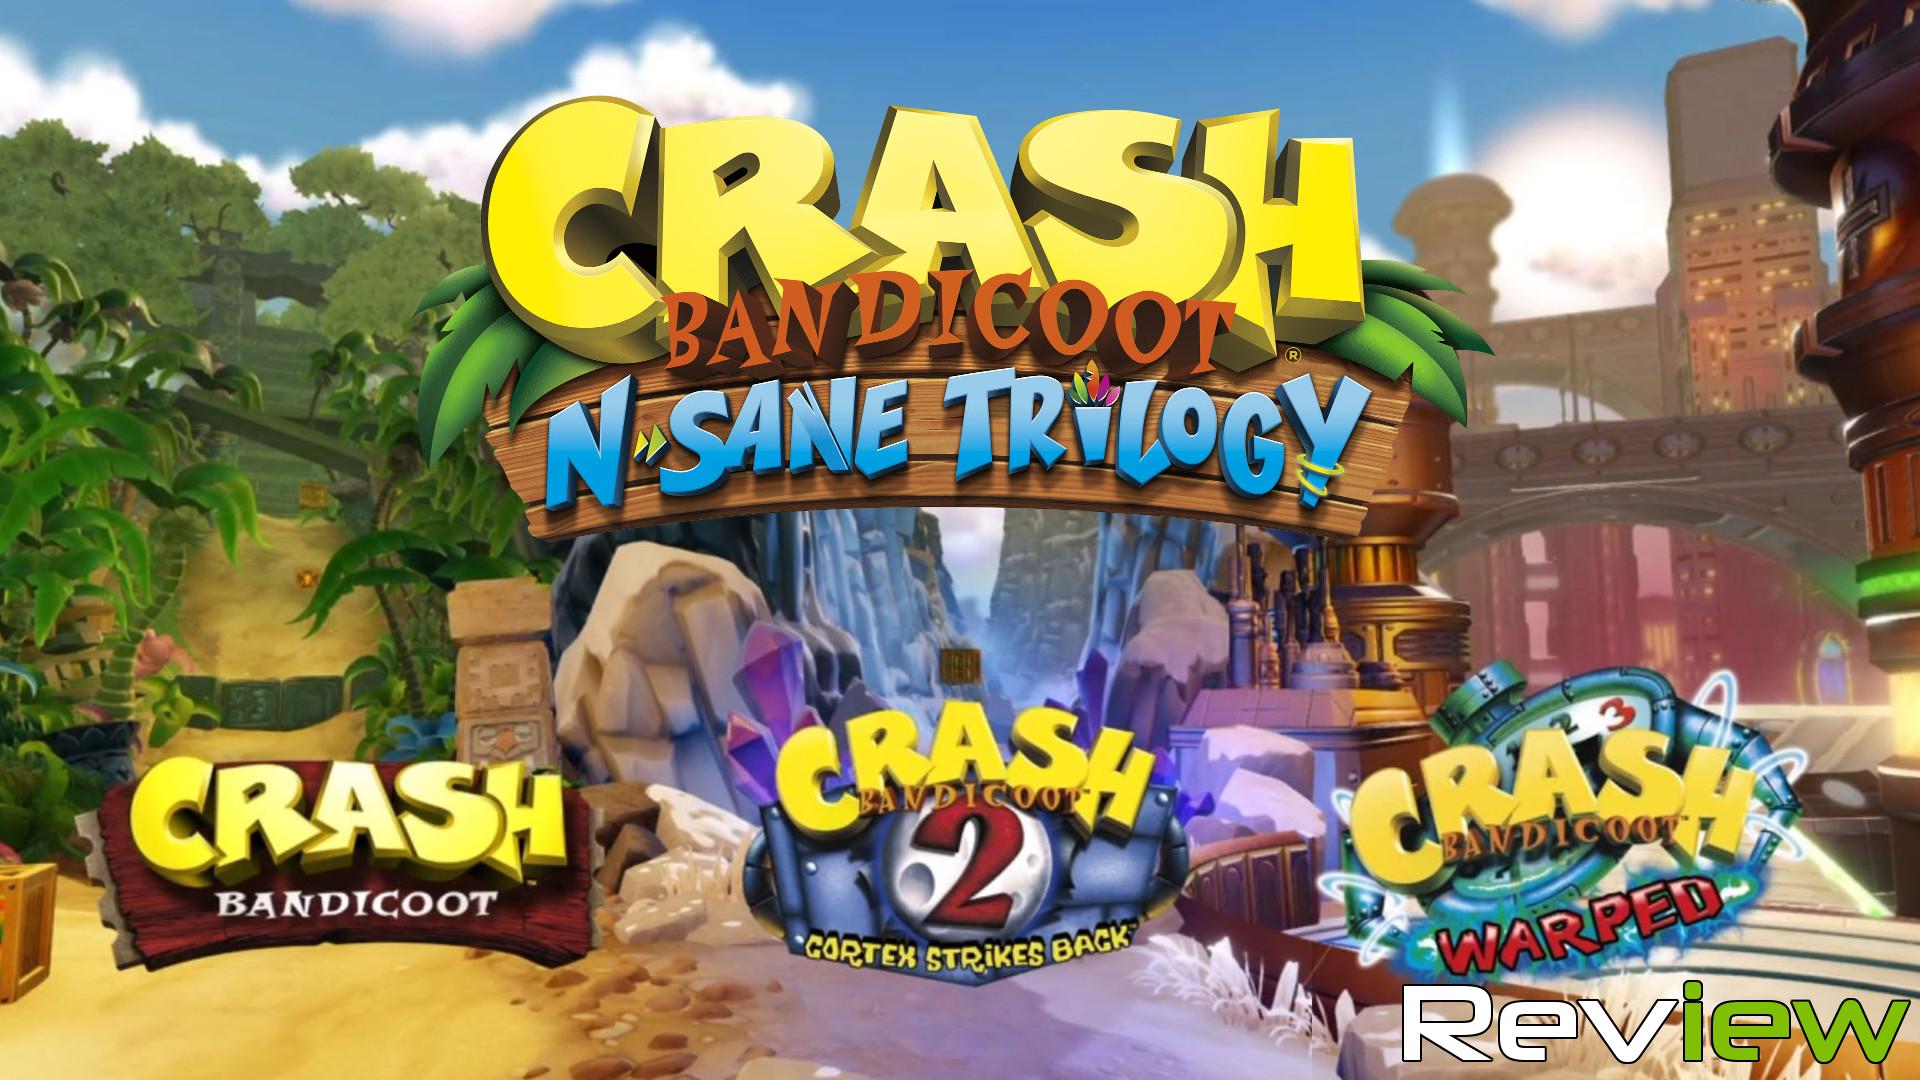 Crash Bandicoot N Crash Bandicoot N Sane Trilogy 2 Player